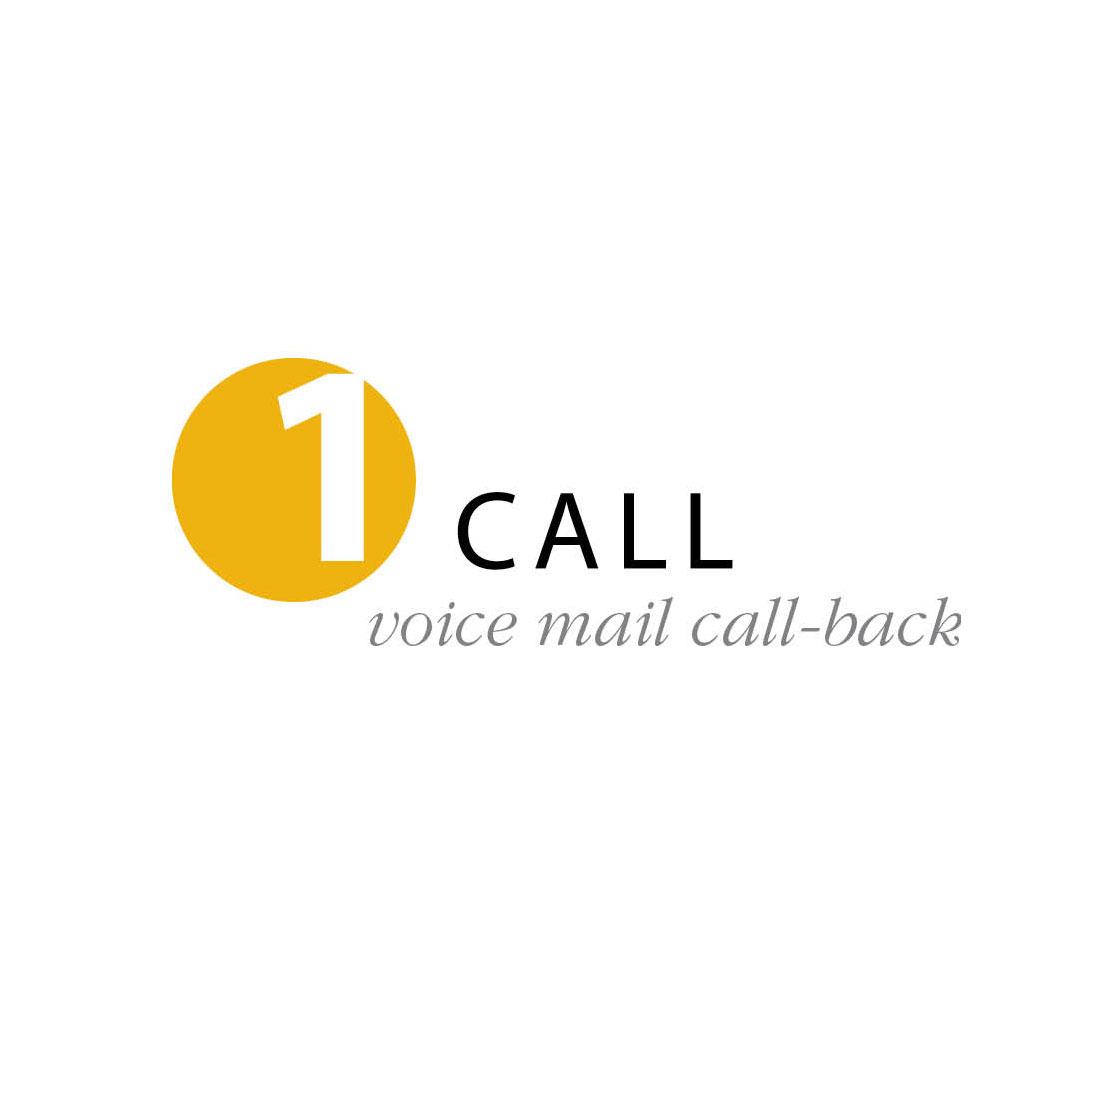 onecall.jpg